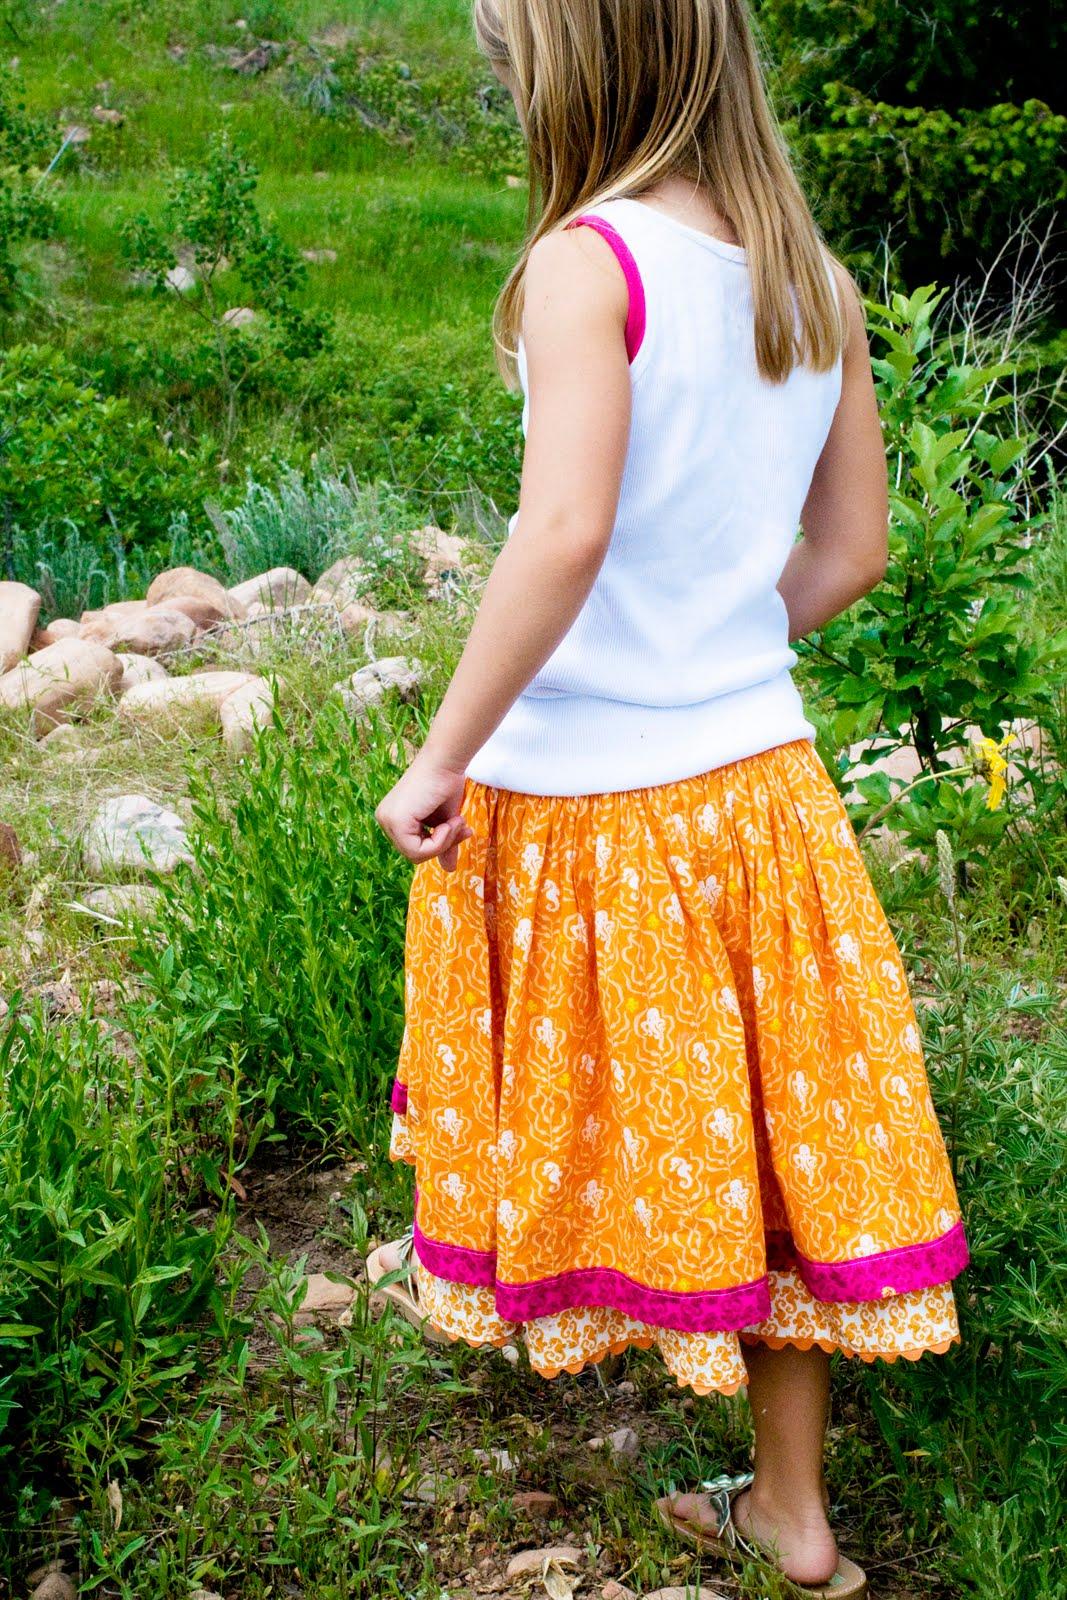 Imgsrc Ru Girls Skirts Sorğusuna Uyğun şekilleri Pulsuz